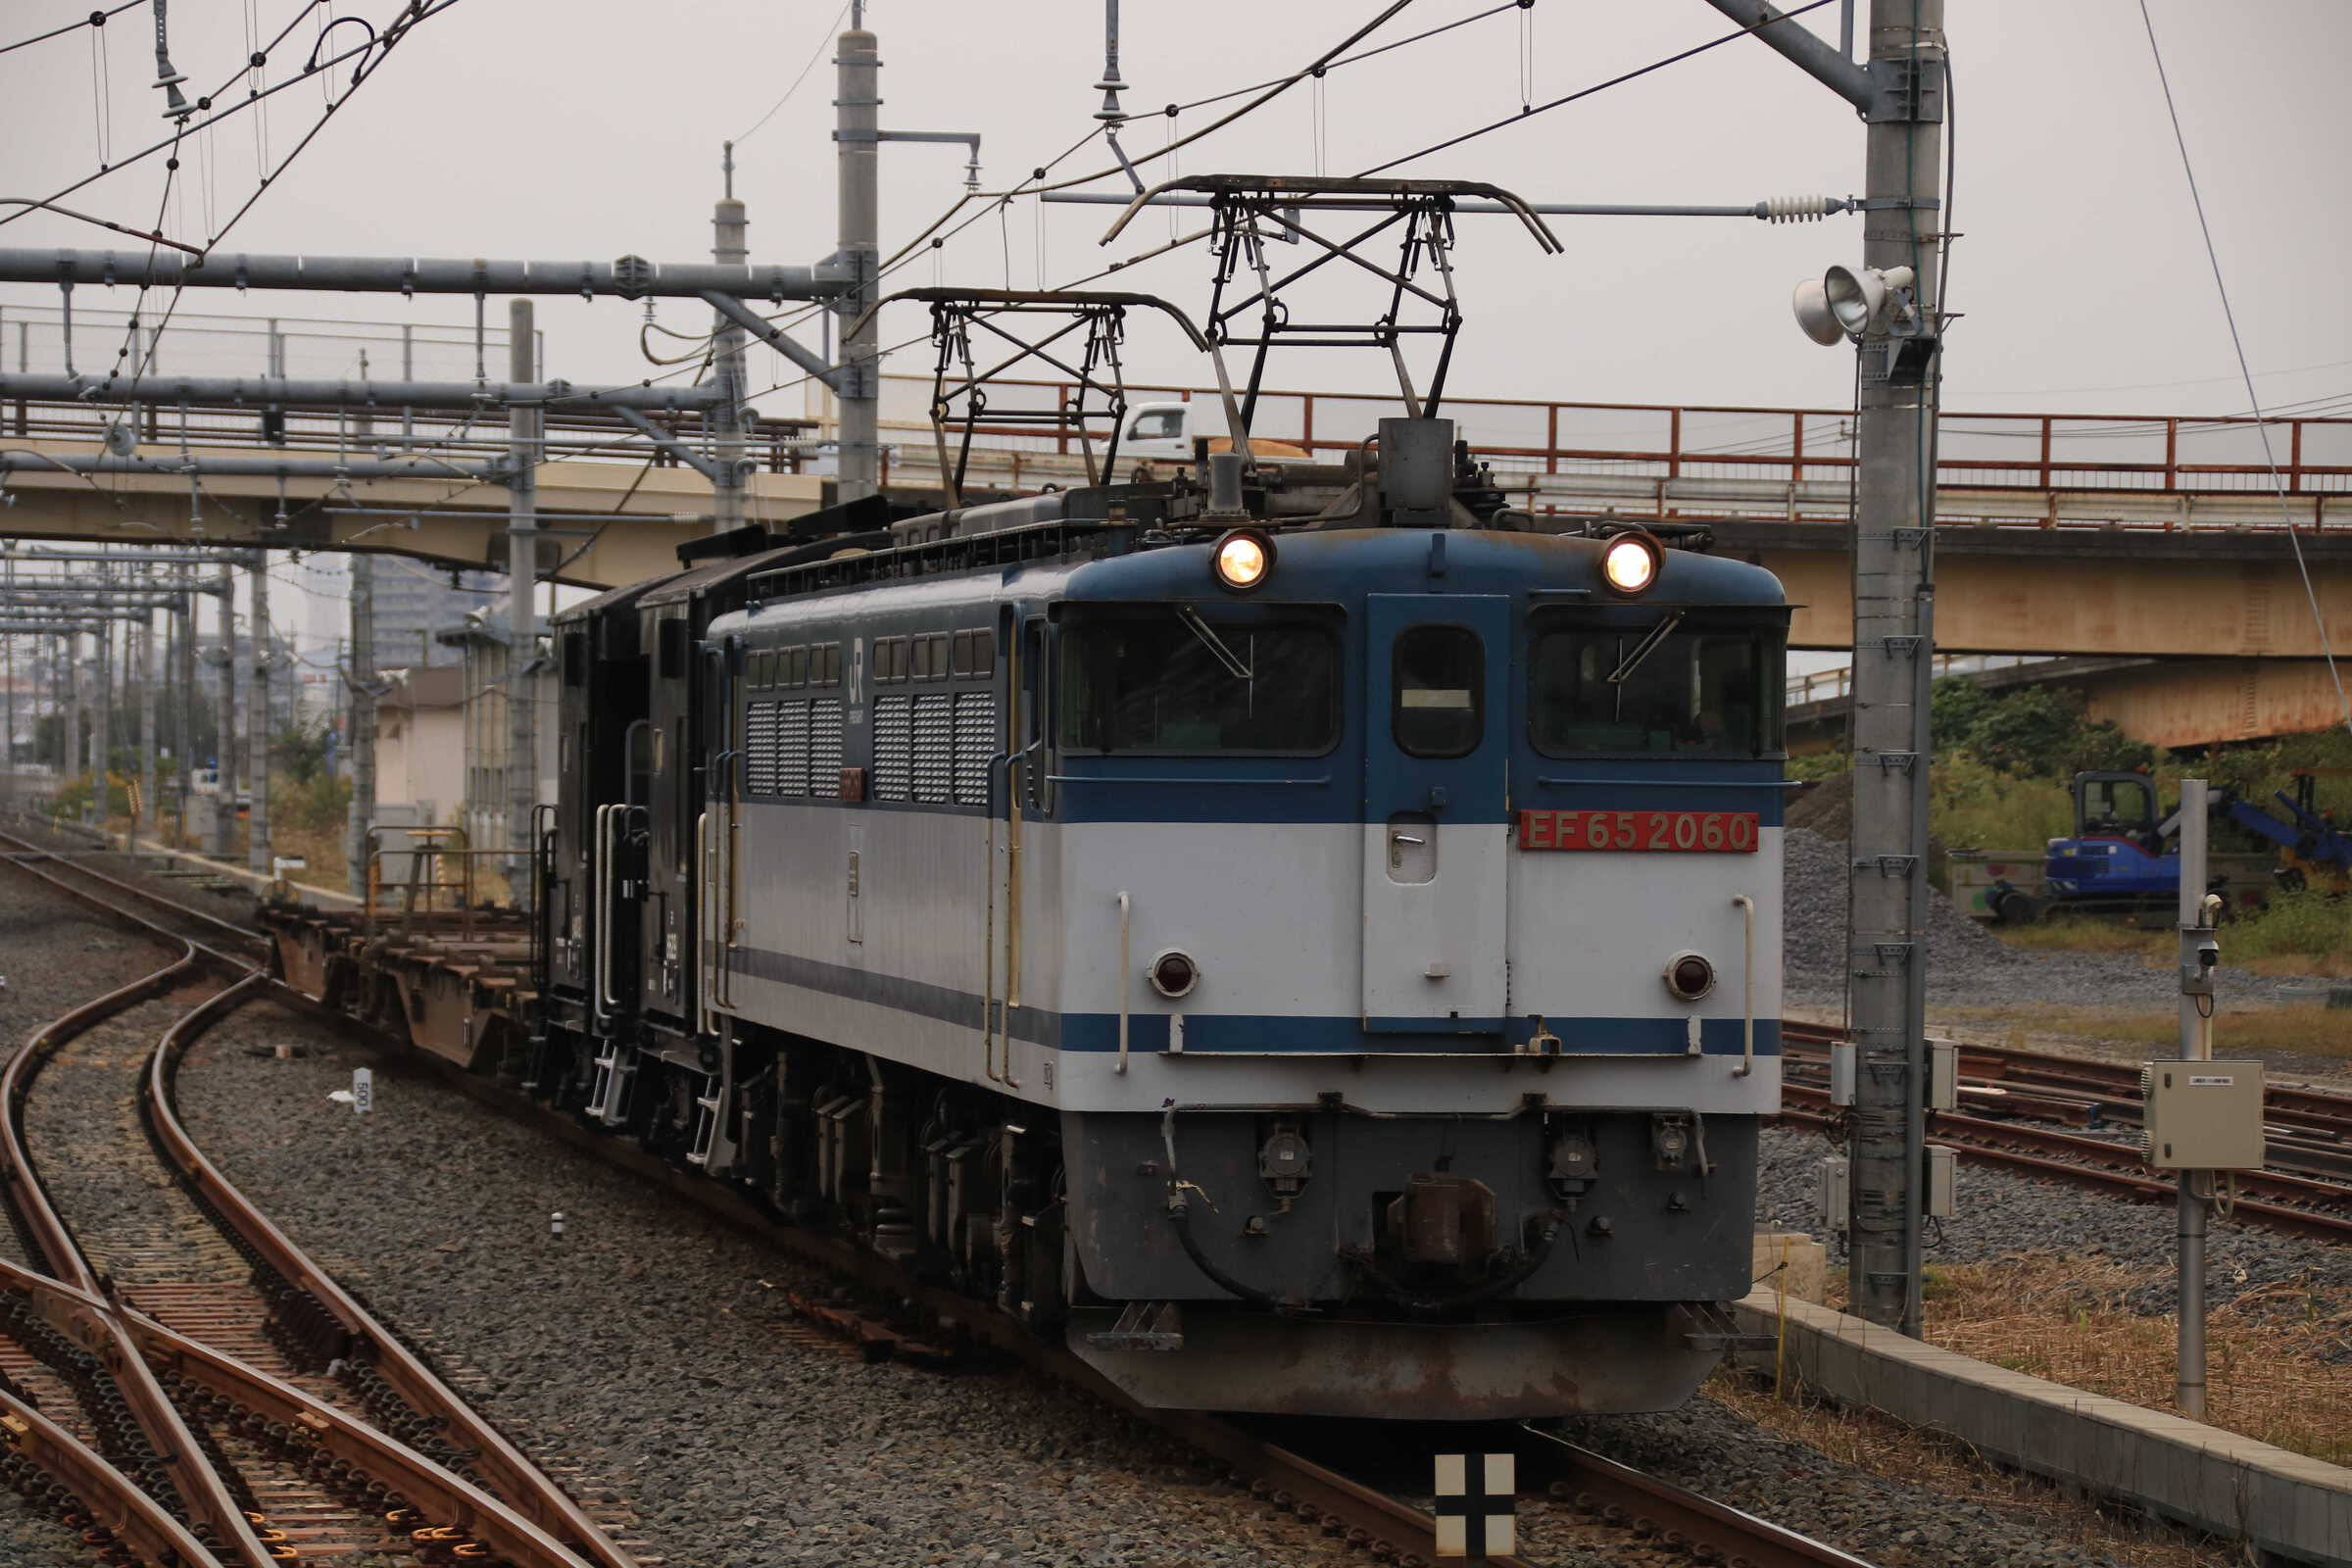 配8790列車 EF65-2060②[新]<臨A907>+ヨ2B+コキ2B